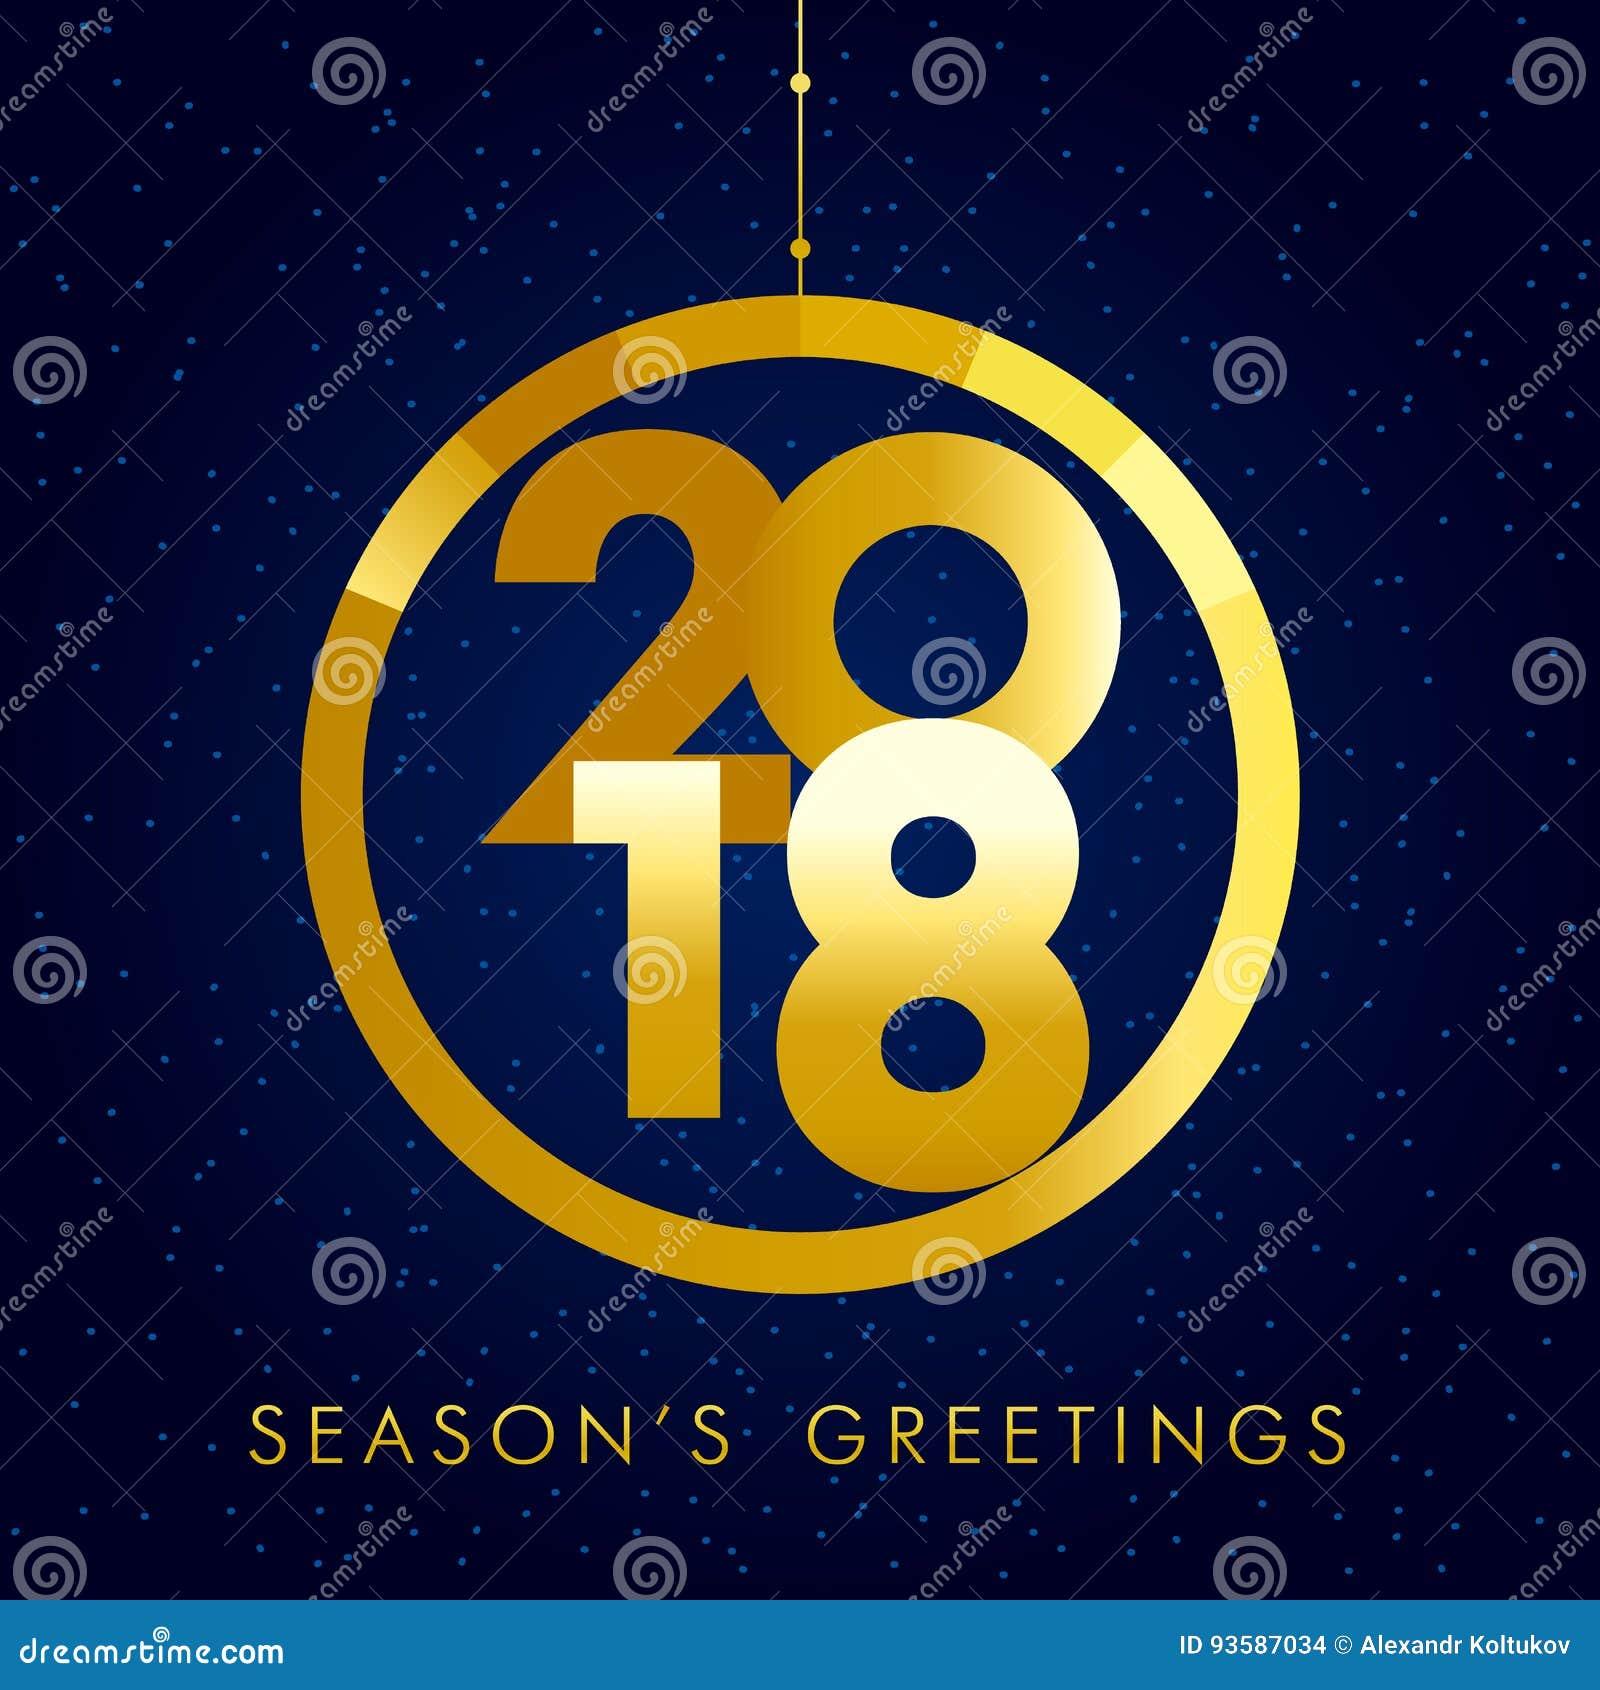 2018 Seasons Greetings Gold Happy New Year Card Stock Vector